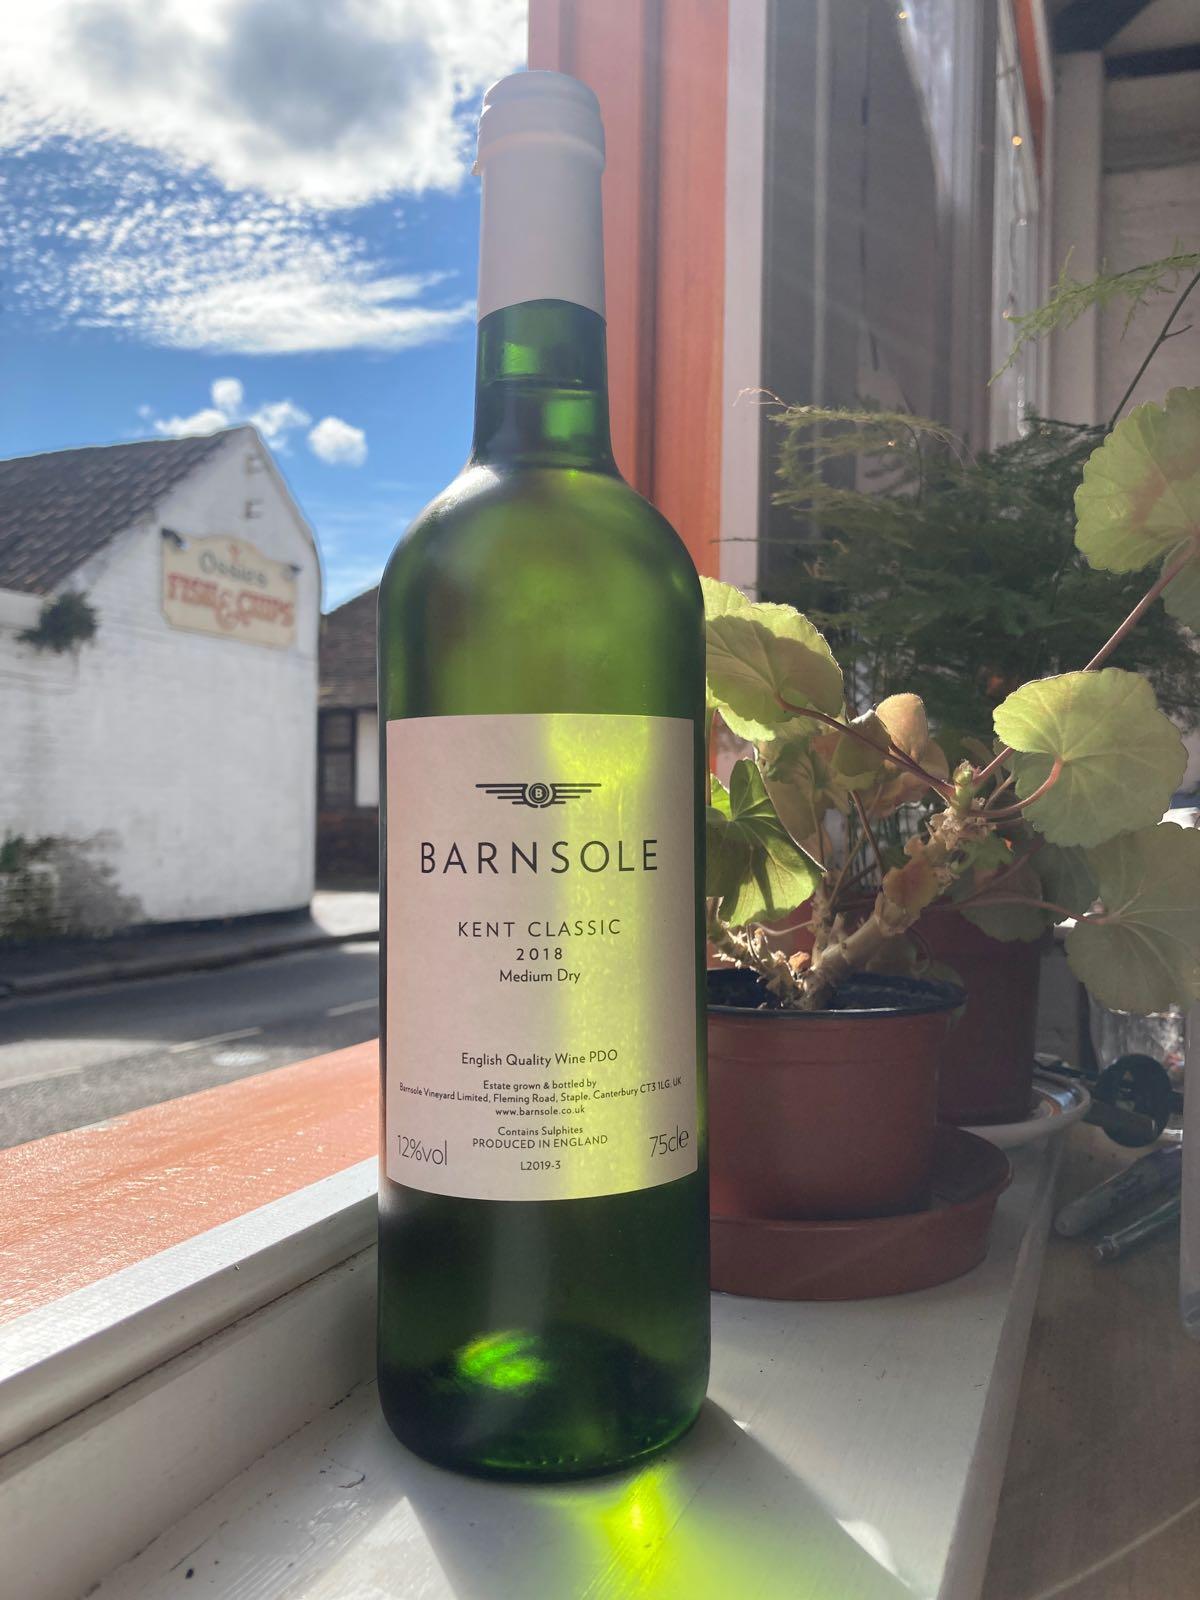 Barnsole - Kent Classic (12%) (Staple, nr Canterbury)